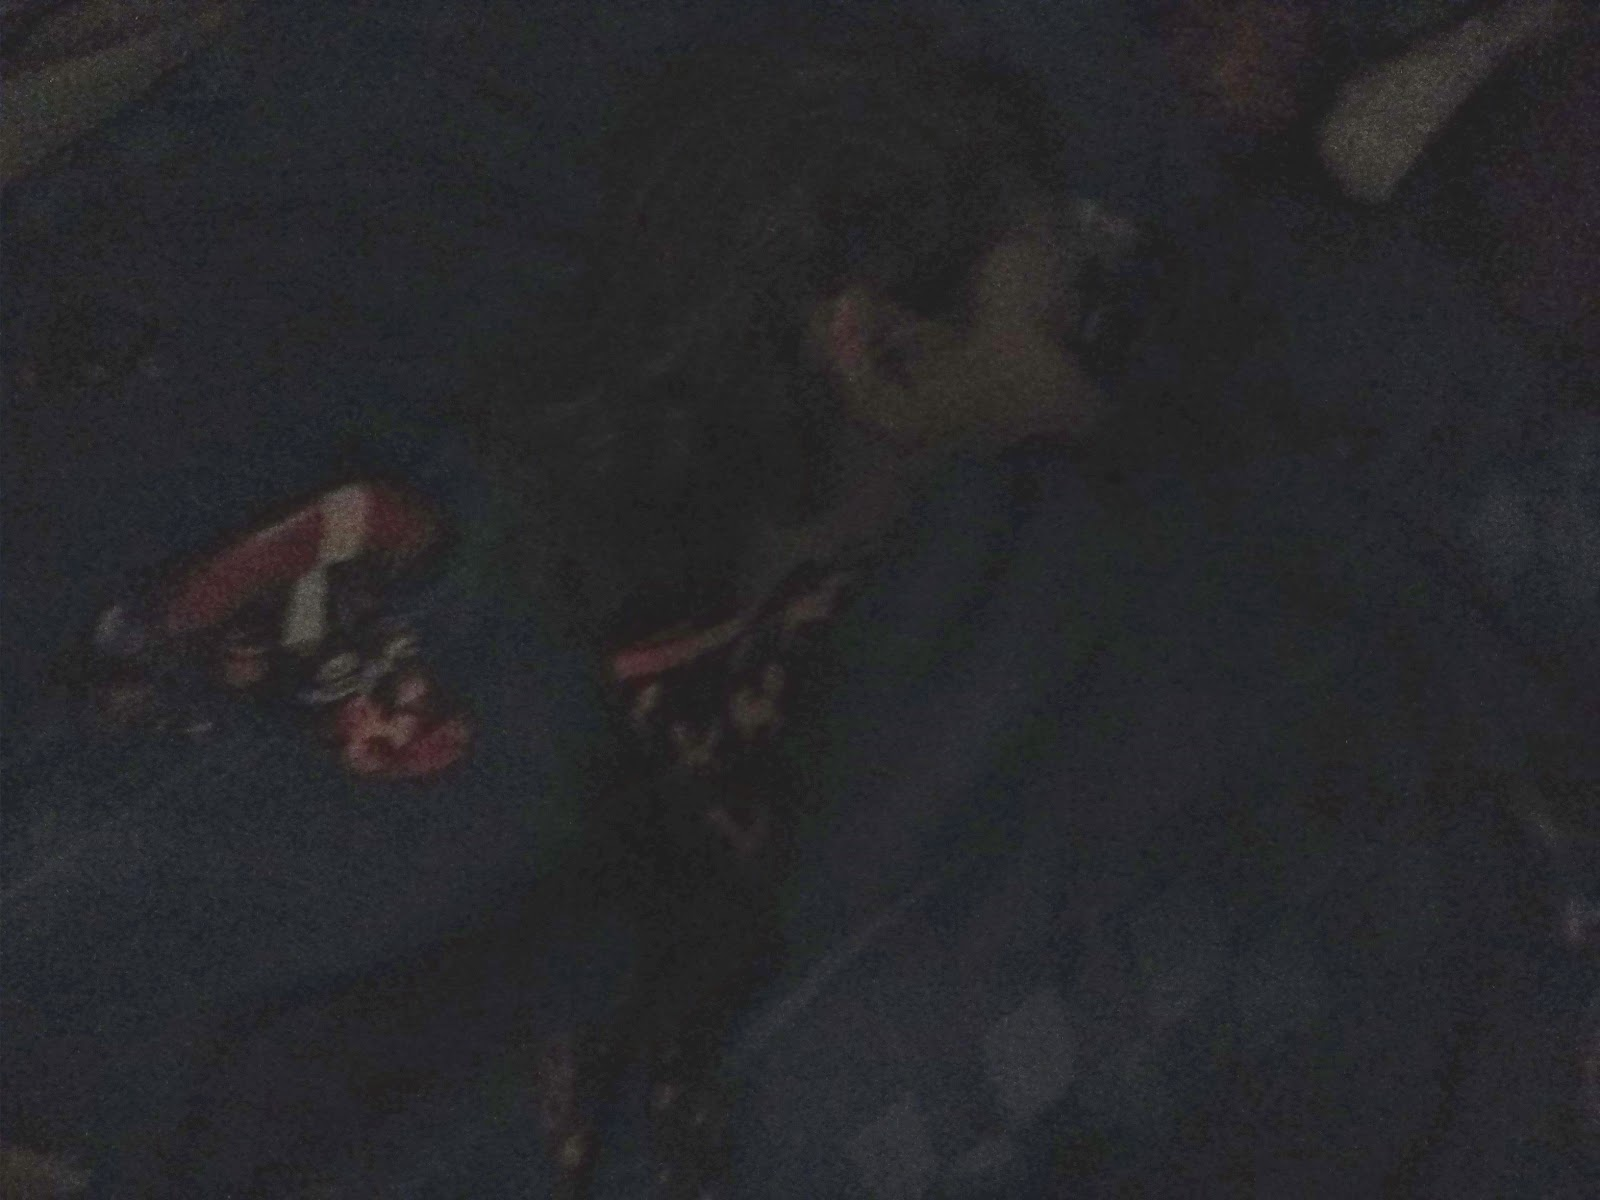 Top Ender in Big Boy's bed